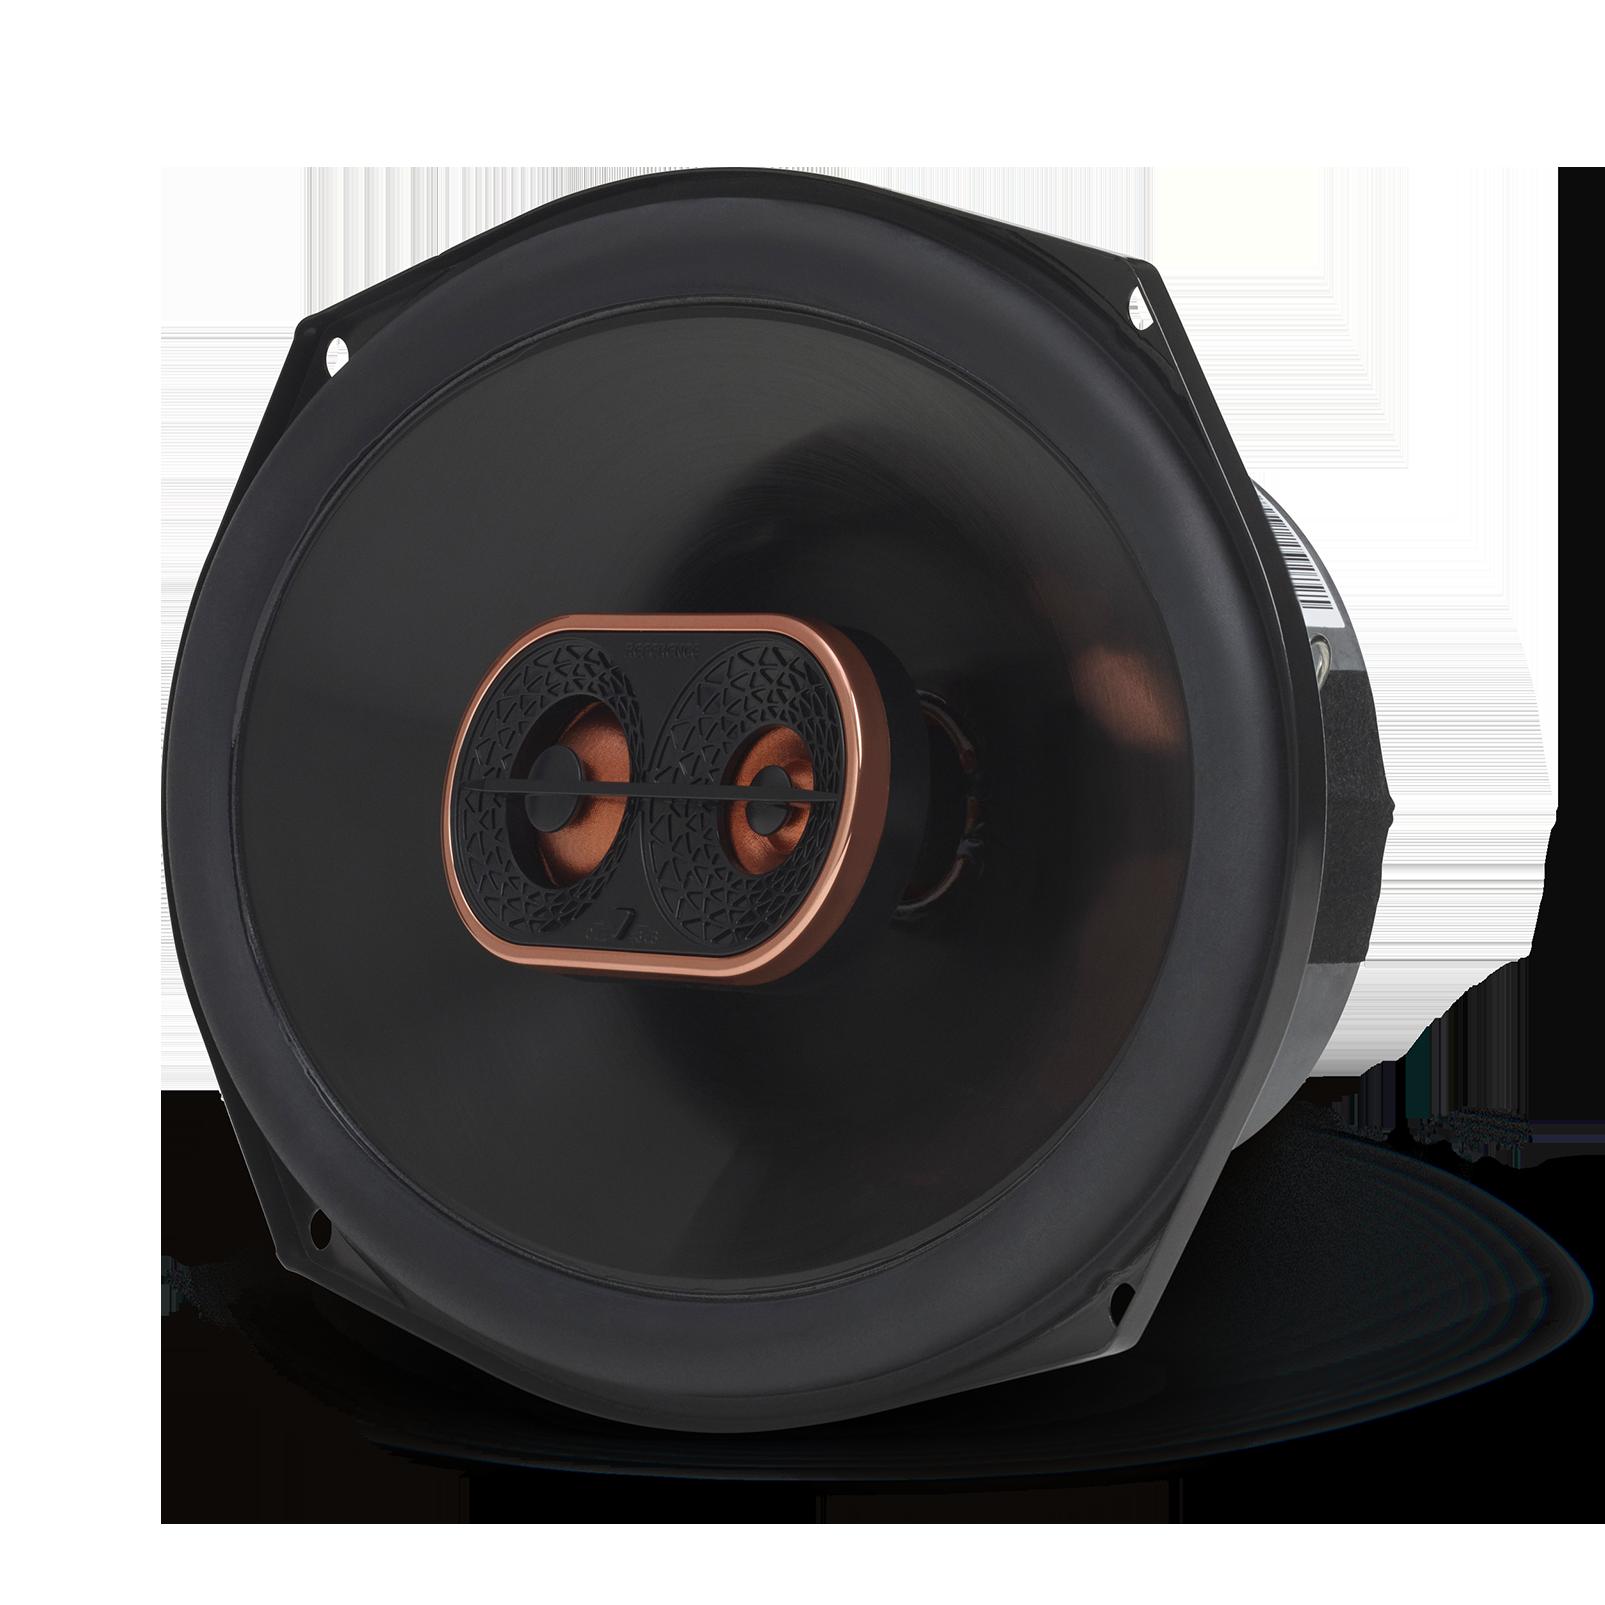 "Reference 9633ix - Black - 6"" x 9"" (152mm x 230mm) 3-way car speaker, 300W - Detailshot 2"